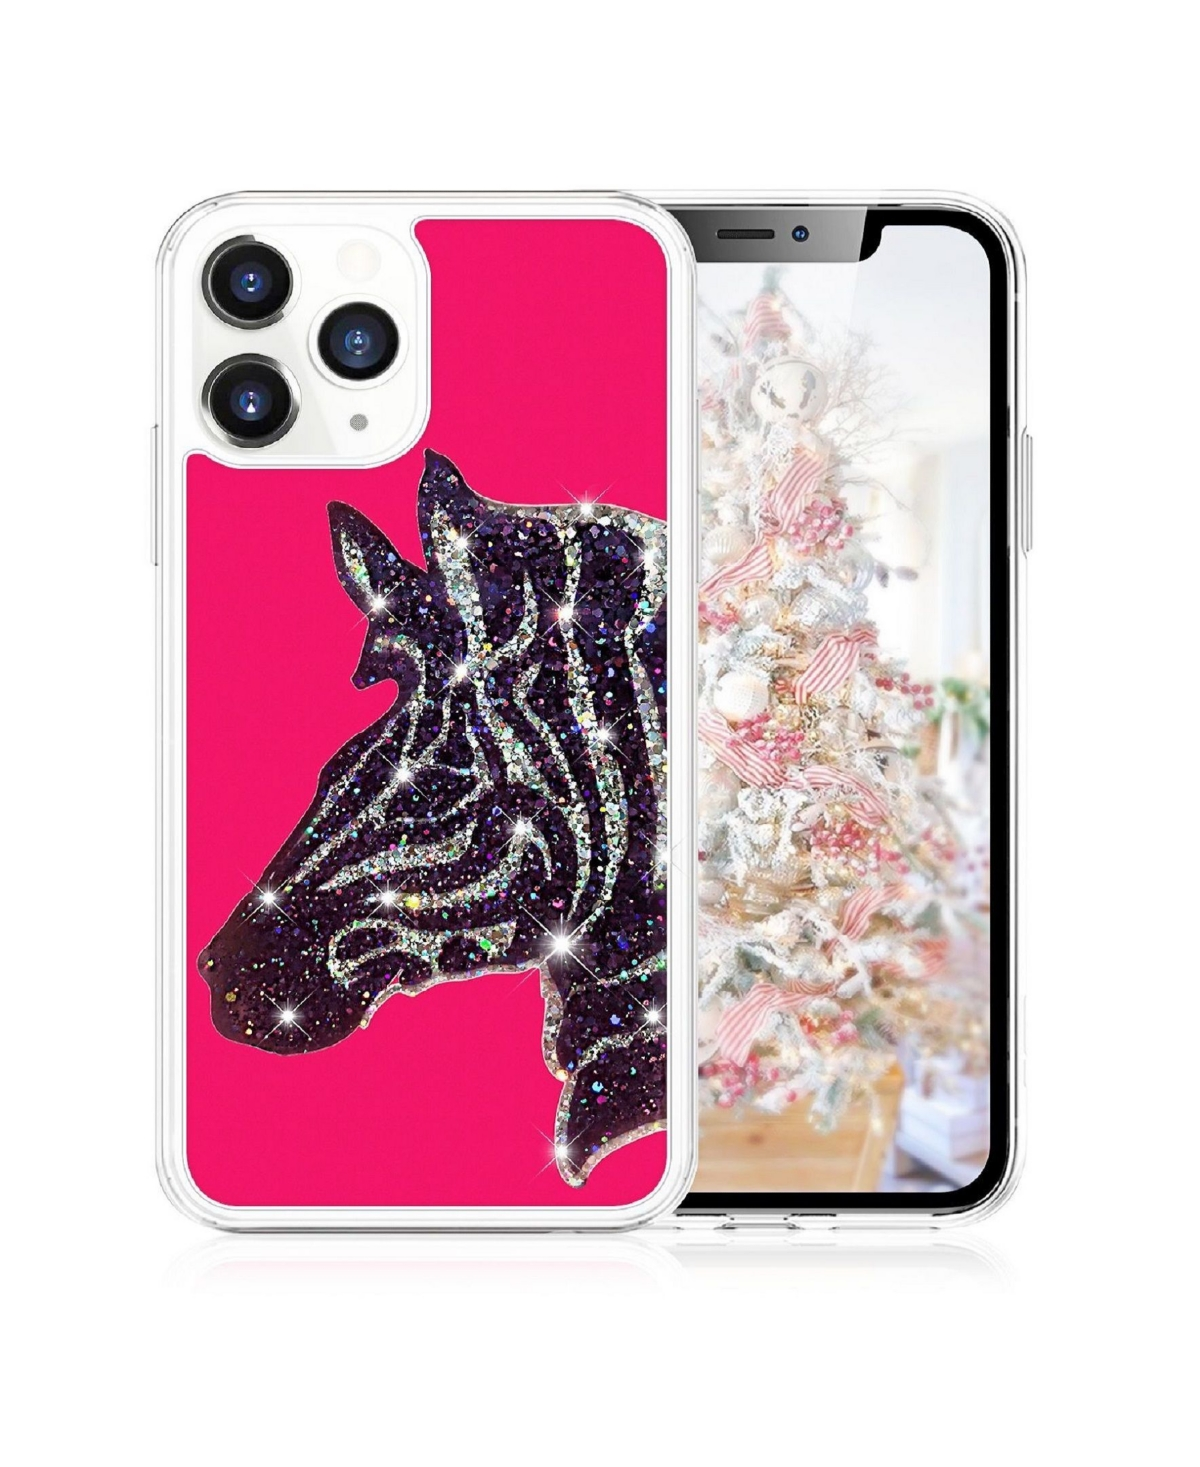 Milanblocks iPhone 11 Pro Max Zebra Glitter Phone Case